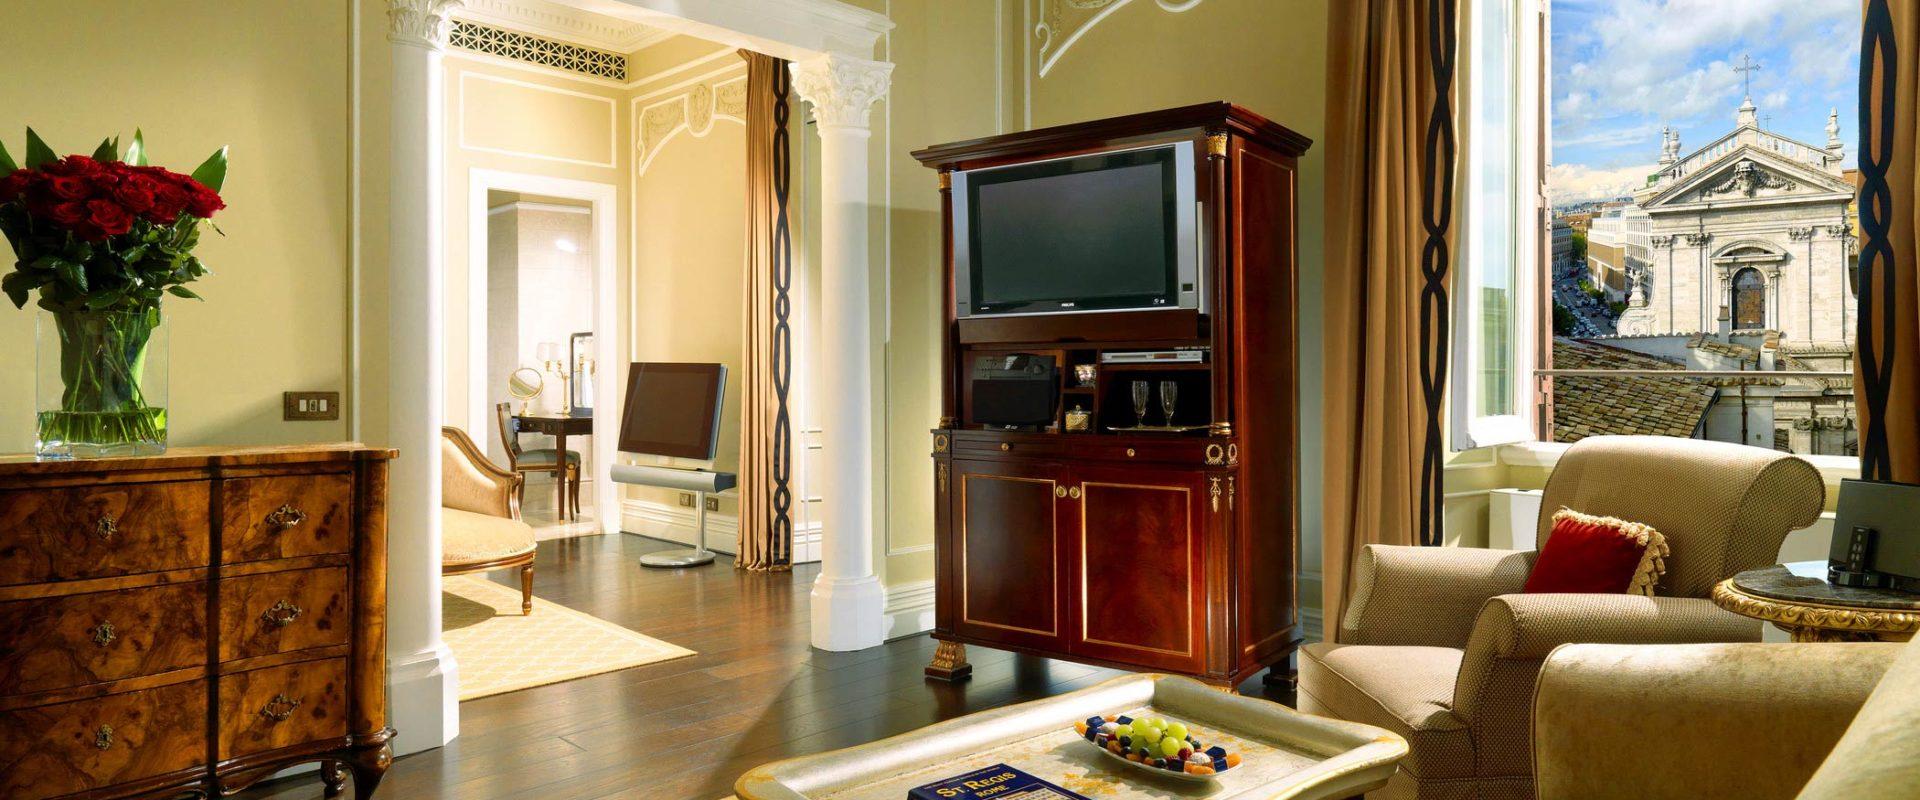 turned-off flat screen TV inside living room